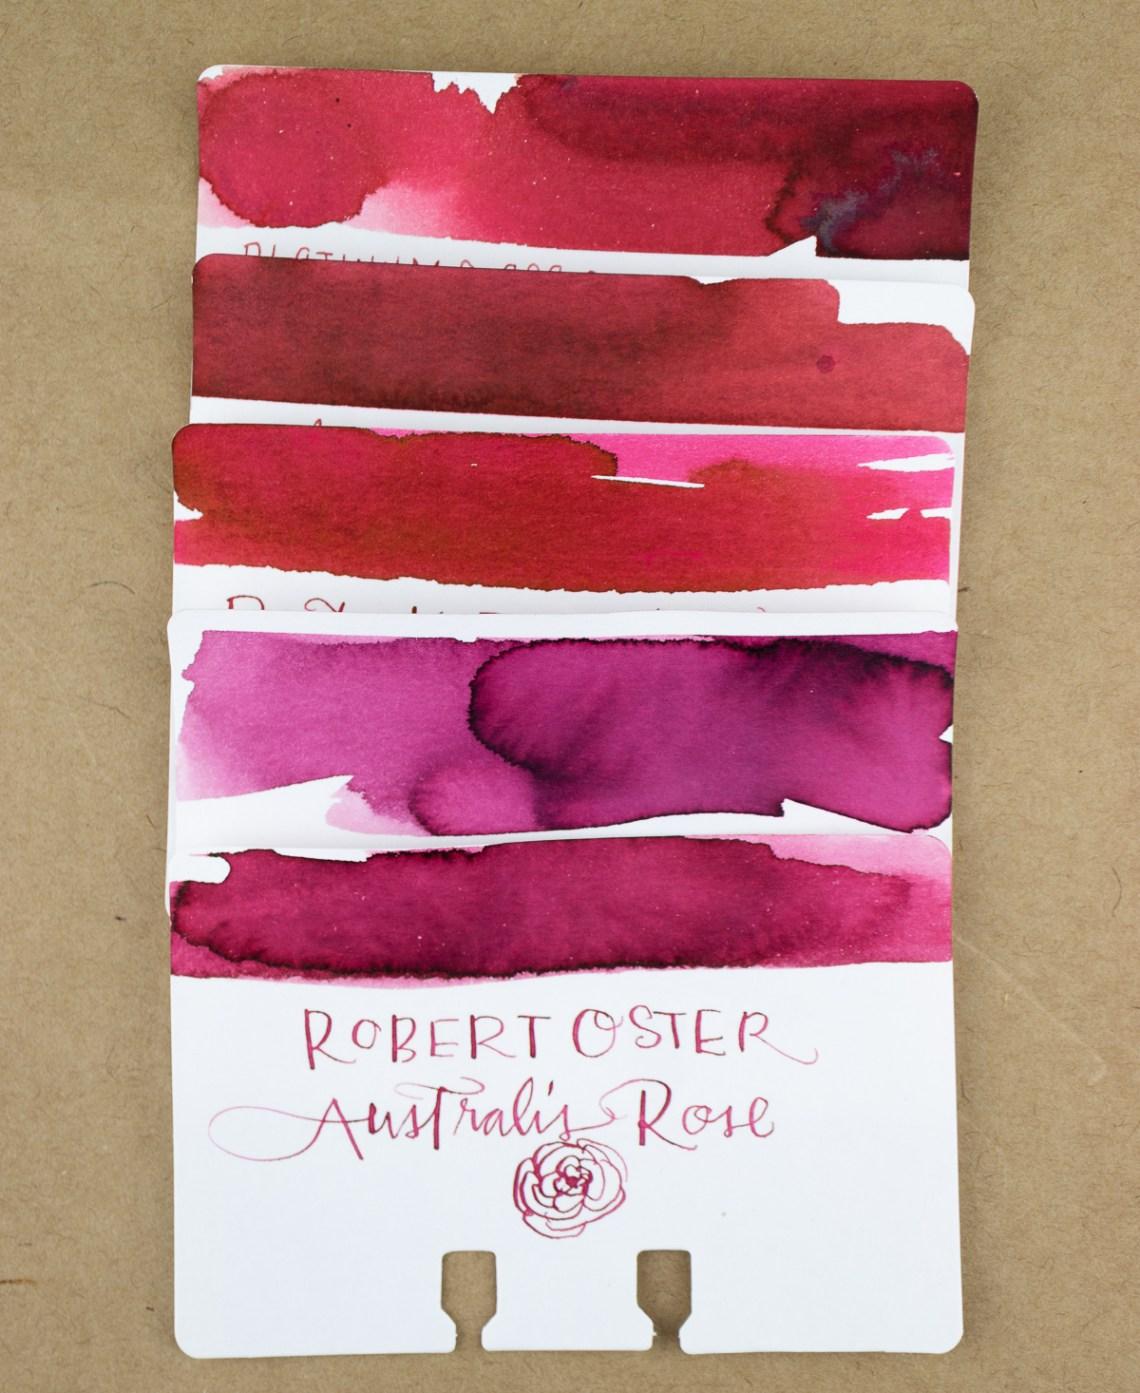 Robert Oster Australis Rose